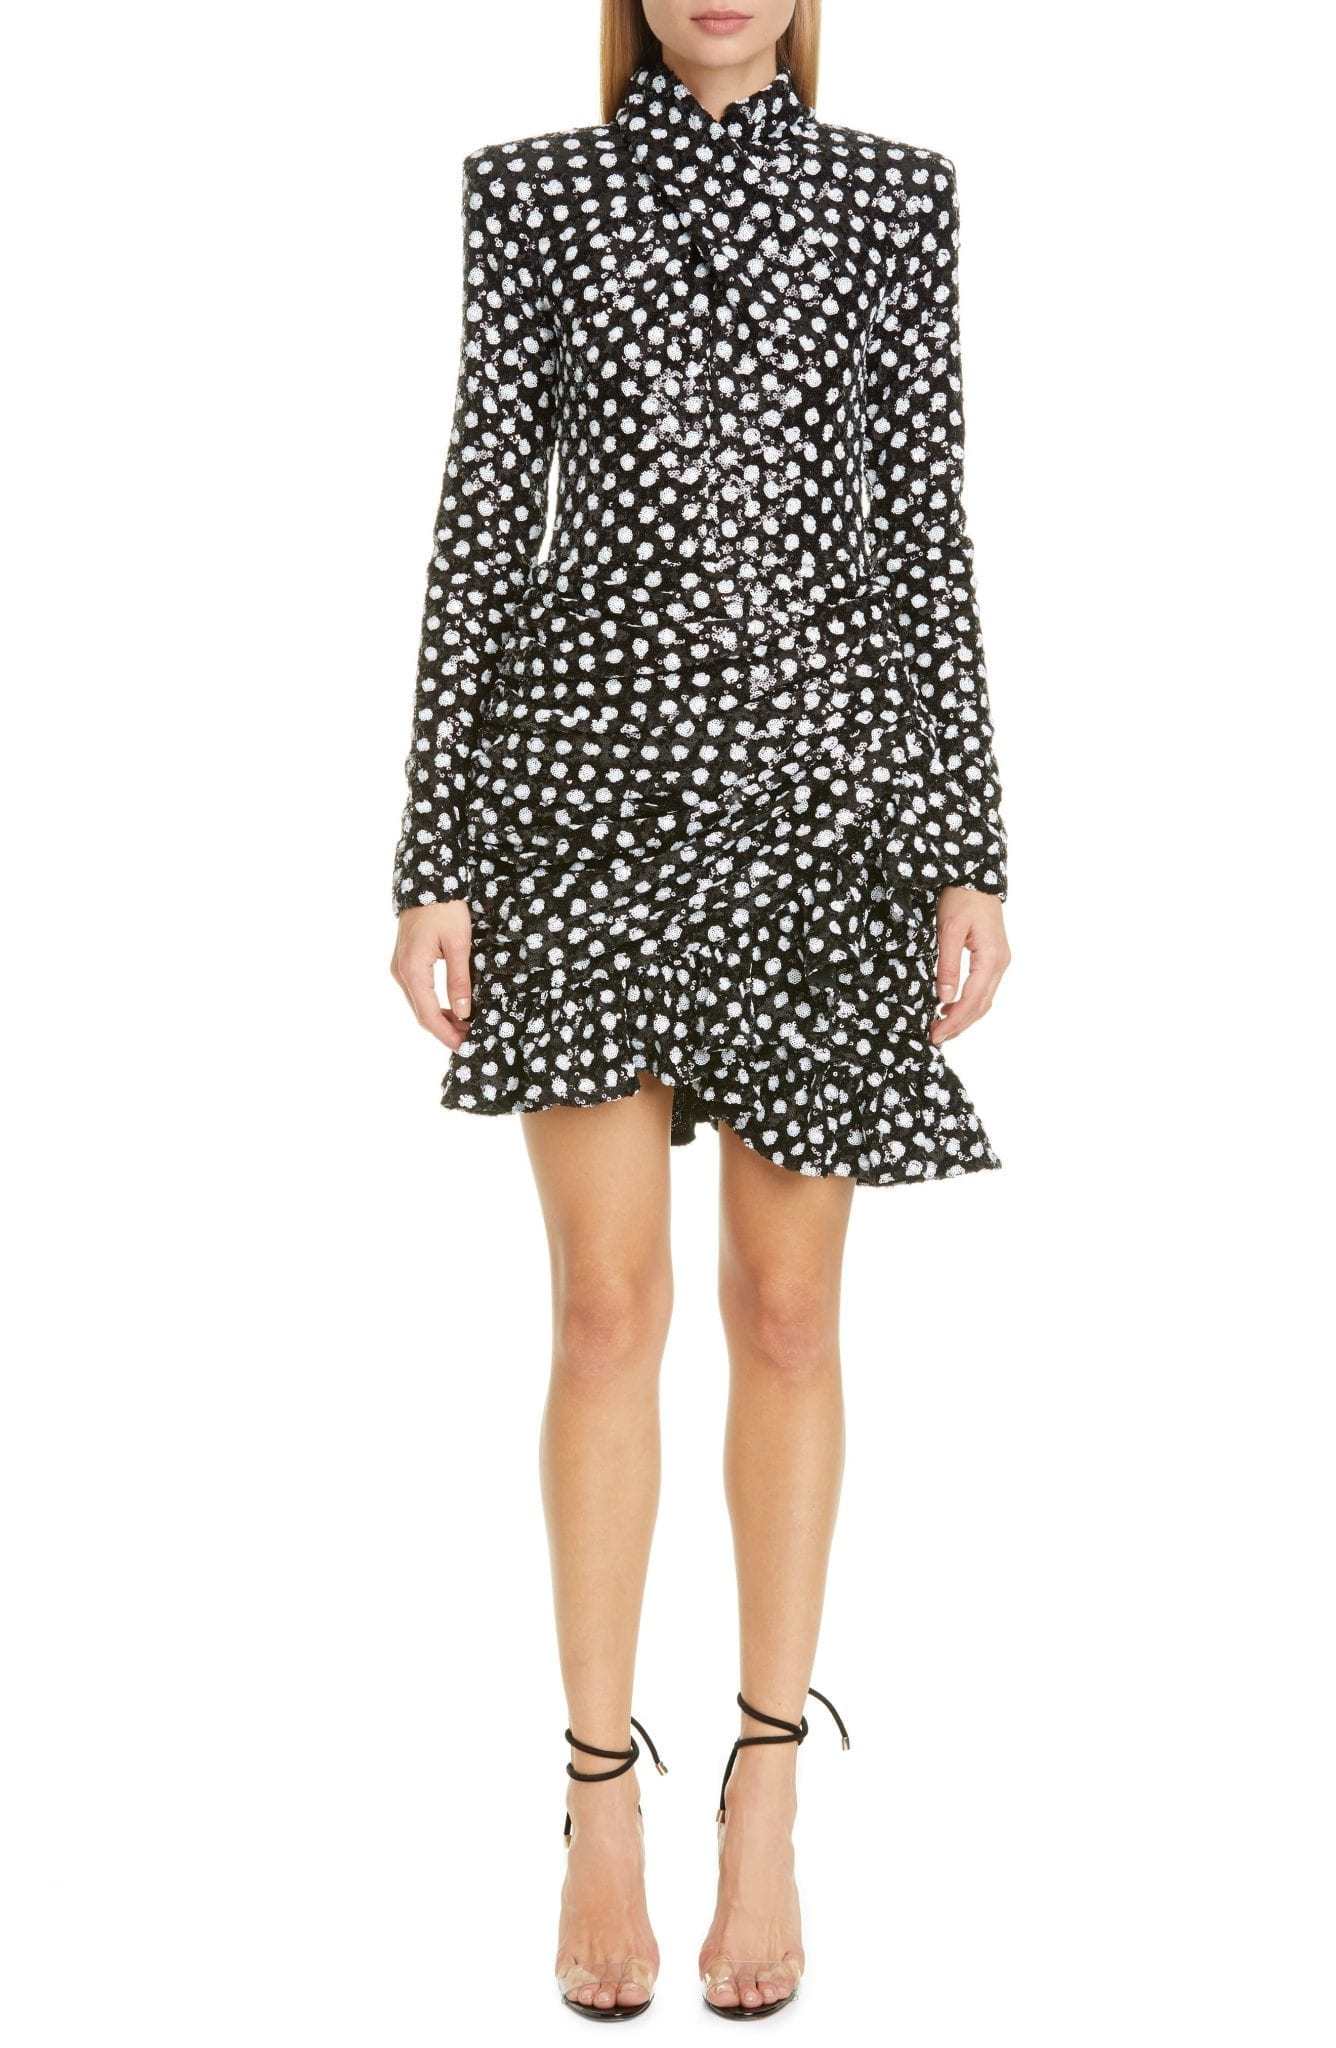 RICHARD QUINN Rara Dot Sequin Long Sleeve Mini Dress